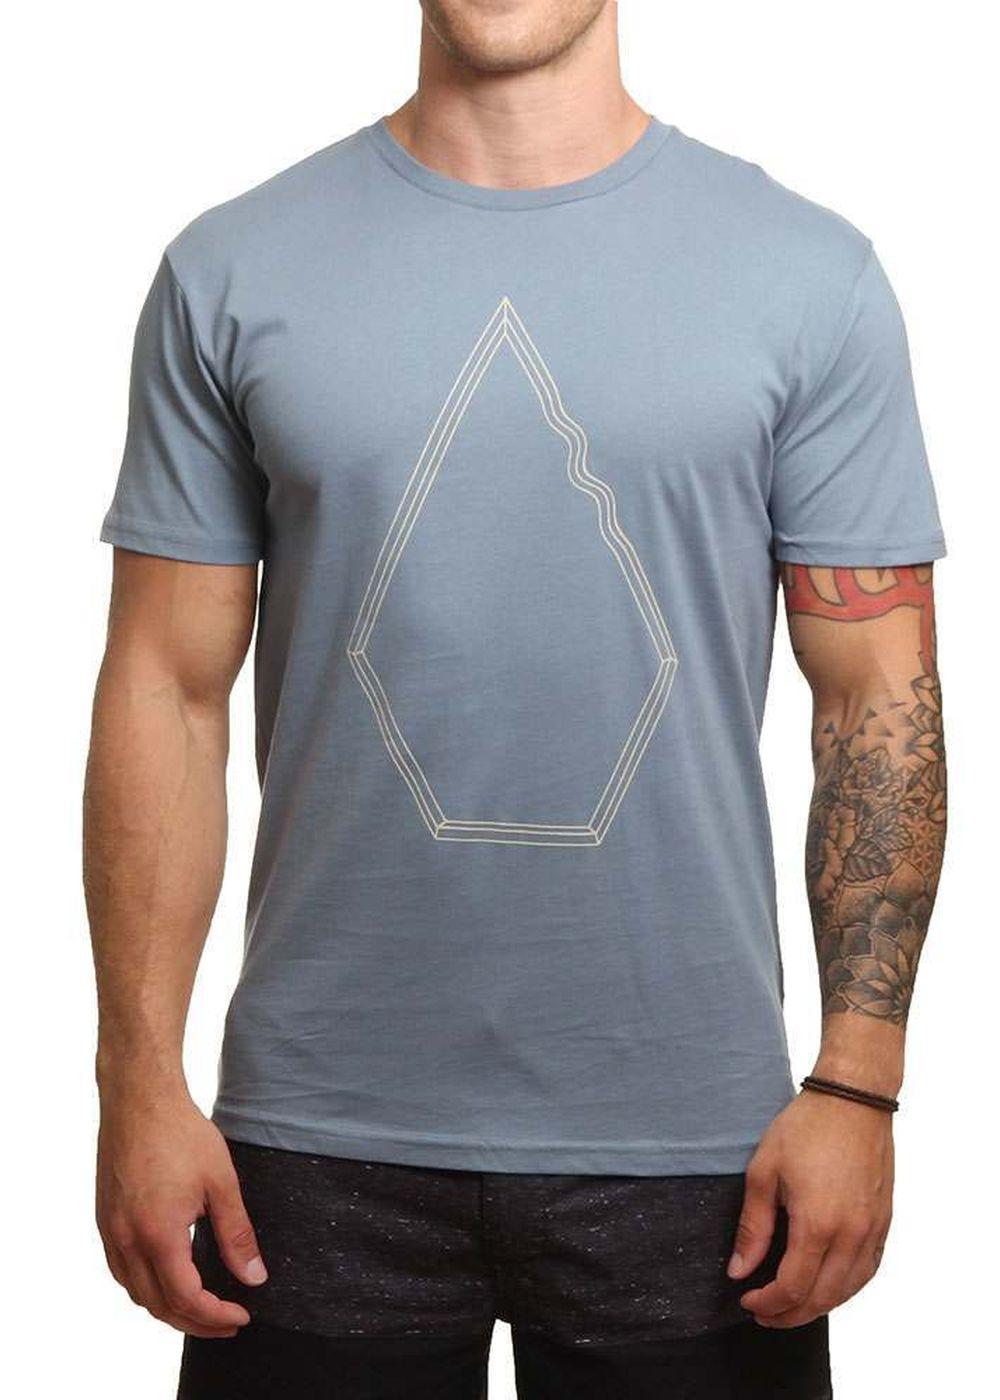 volcom-drew-tee-ash-blue